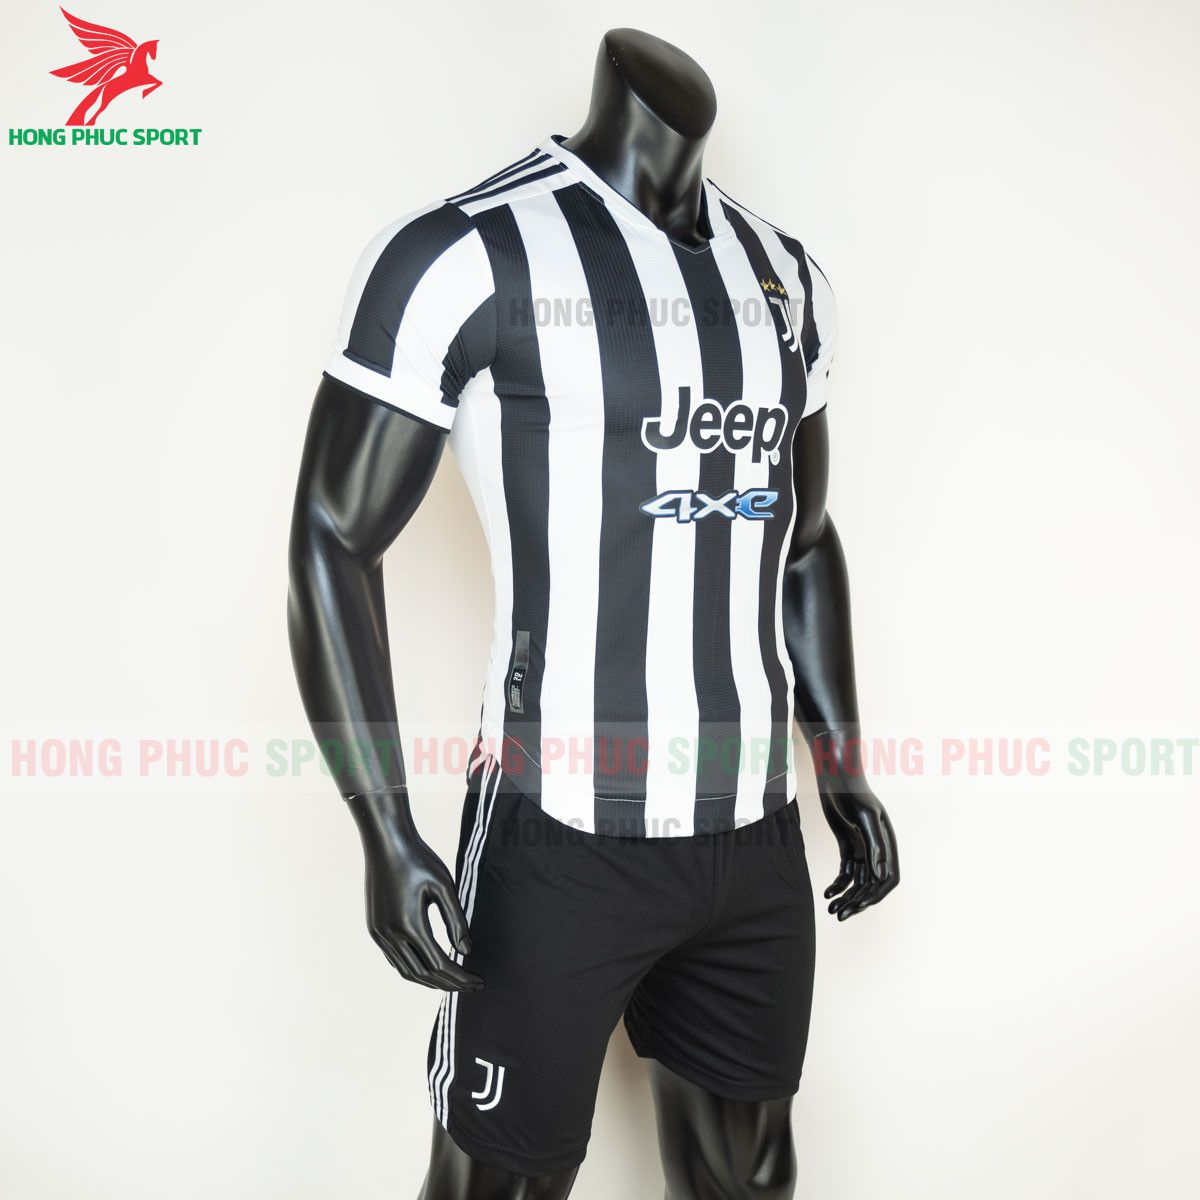 https://cdn.hongphucsport.com/unsafe/s4.shopbay.vn/files/285/ao-bong-da-juventus-2021-2022-san-nha-hang-thai-4-60d3095bdfba3.jpg